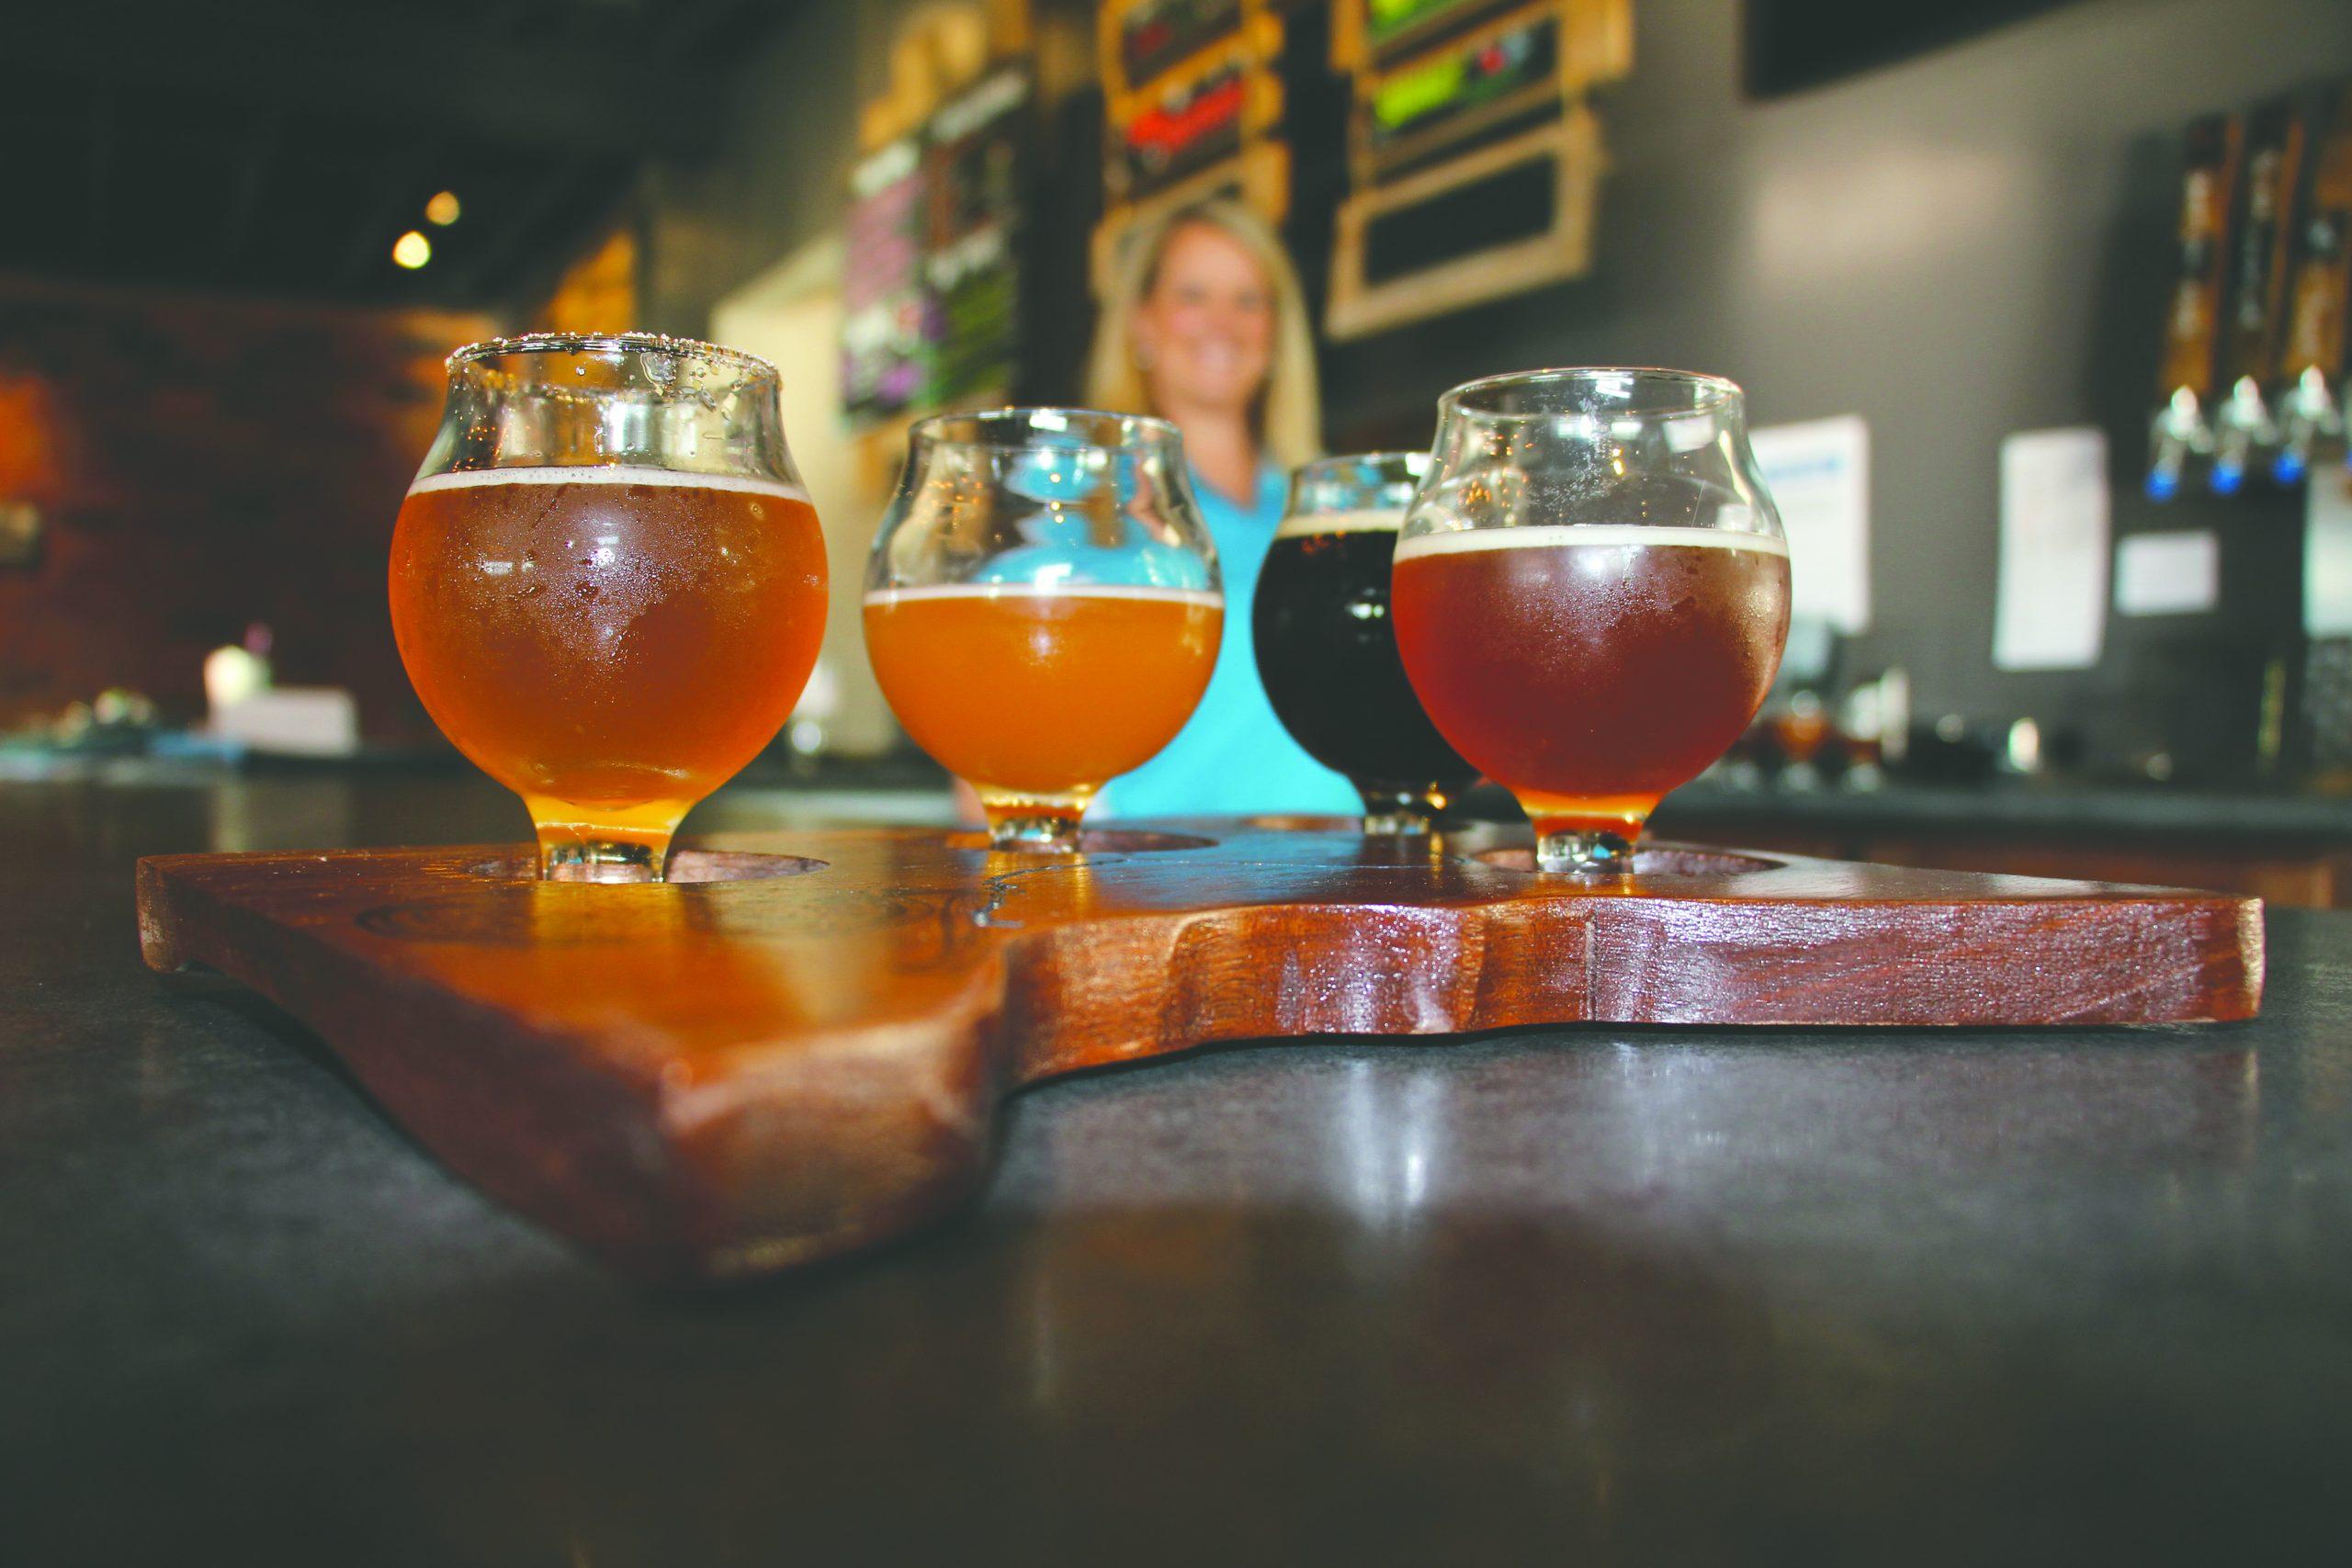 Forbidden Barrel Brewing Co. in Worthington, MN